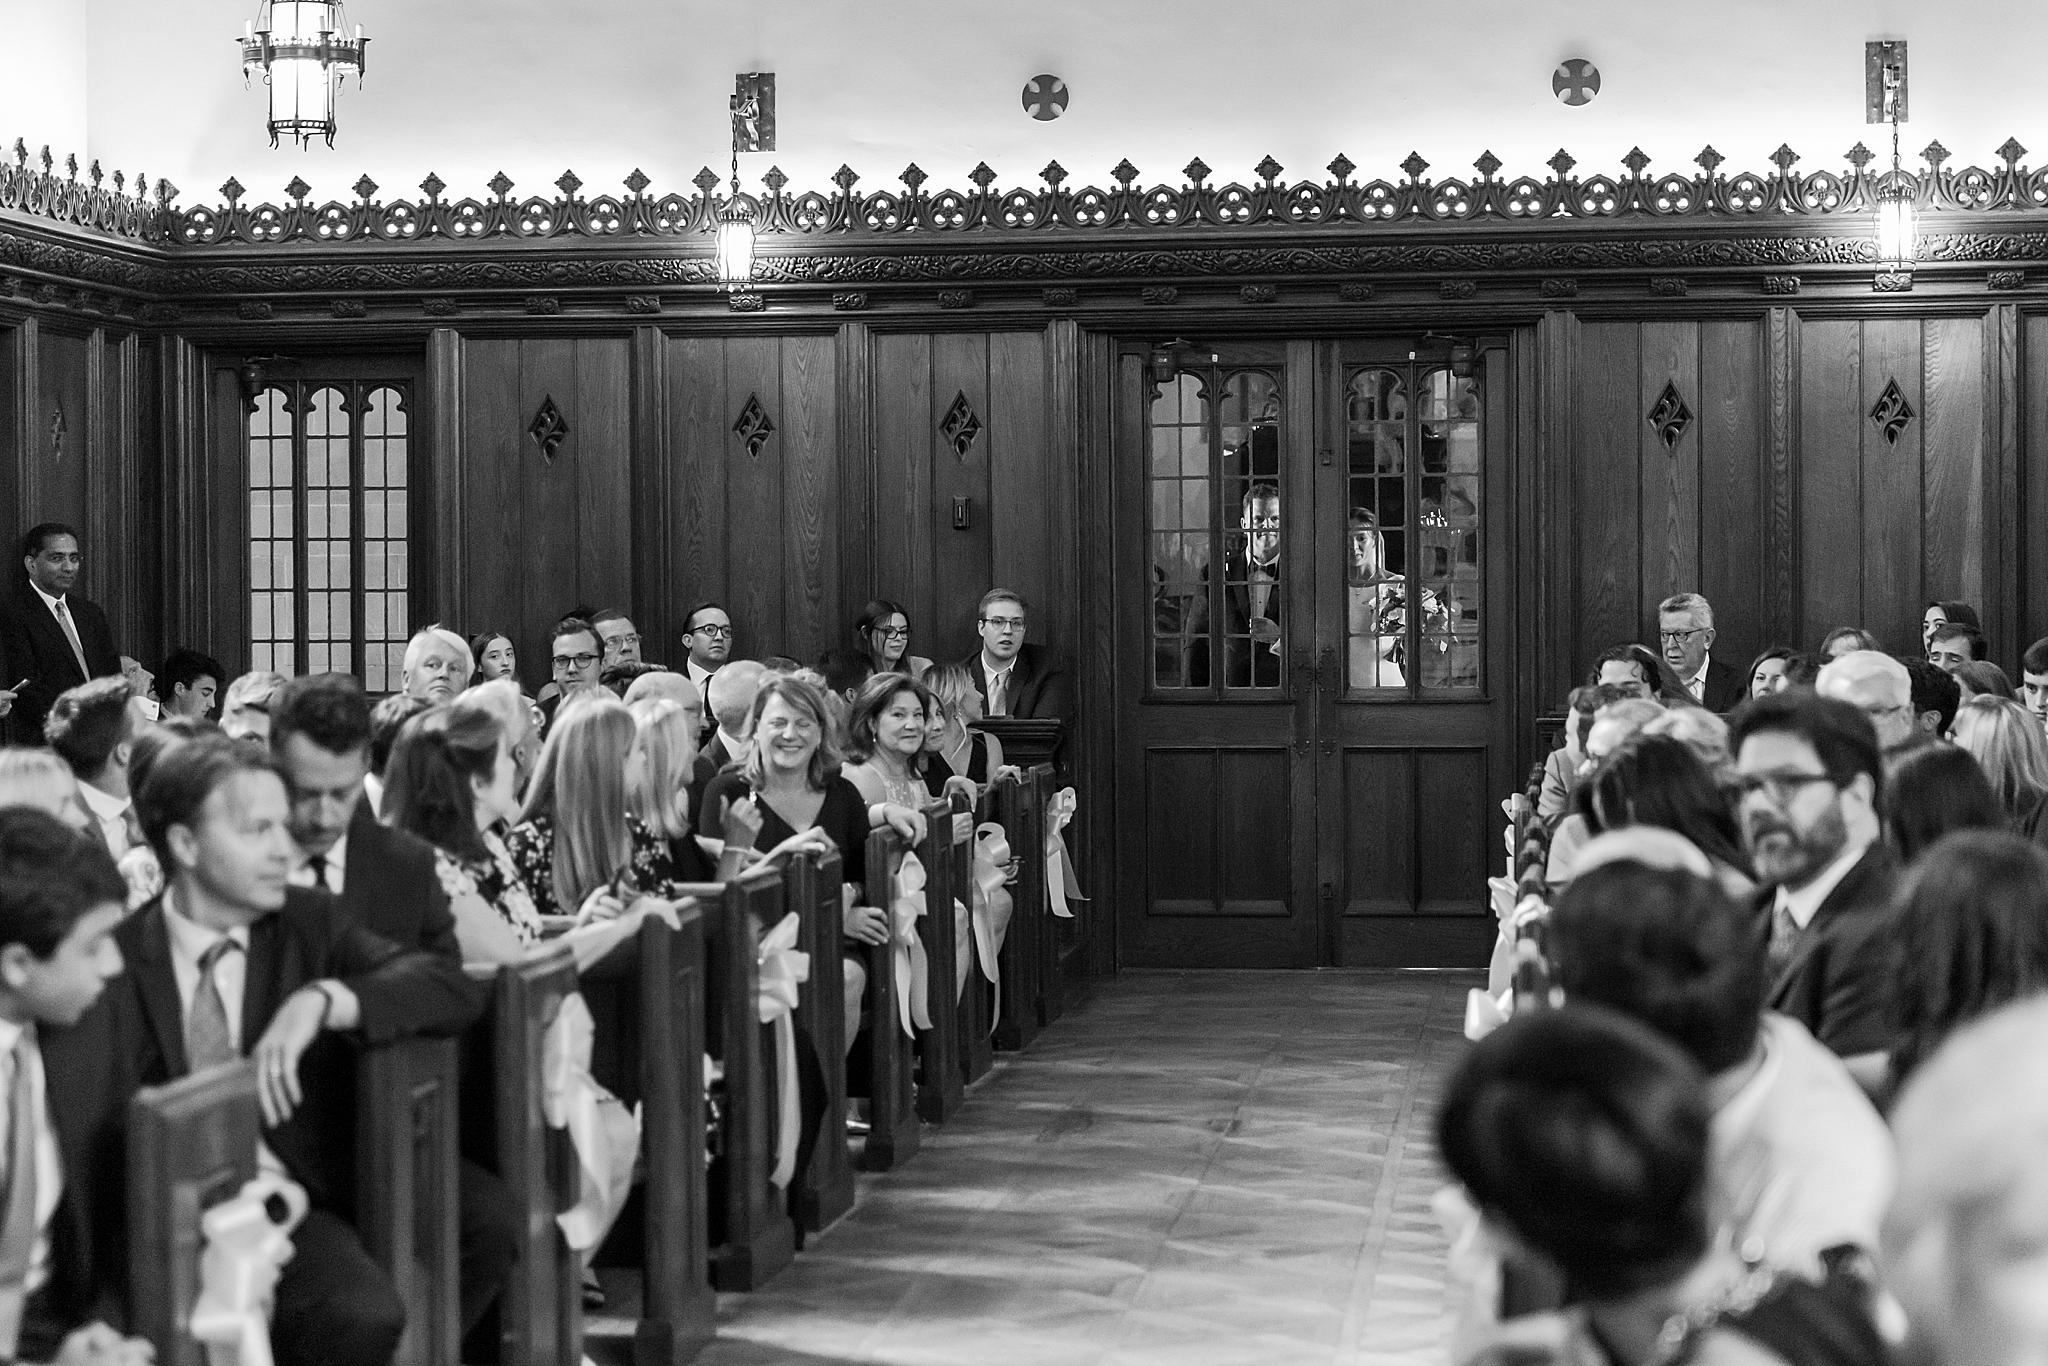 detroit-wedding-photographer-grosse-pointe-academy-chapel-detroit-golf-club-wedding-carly-matt-by-courtney-carolyn-photography_0029.jpg